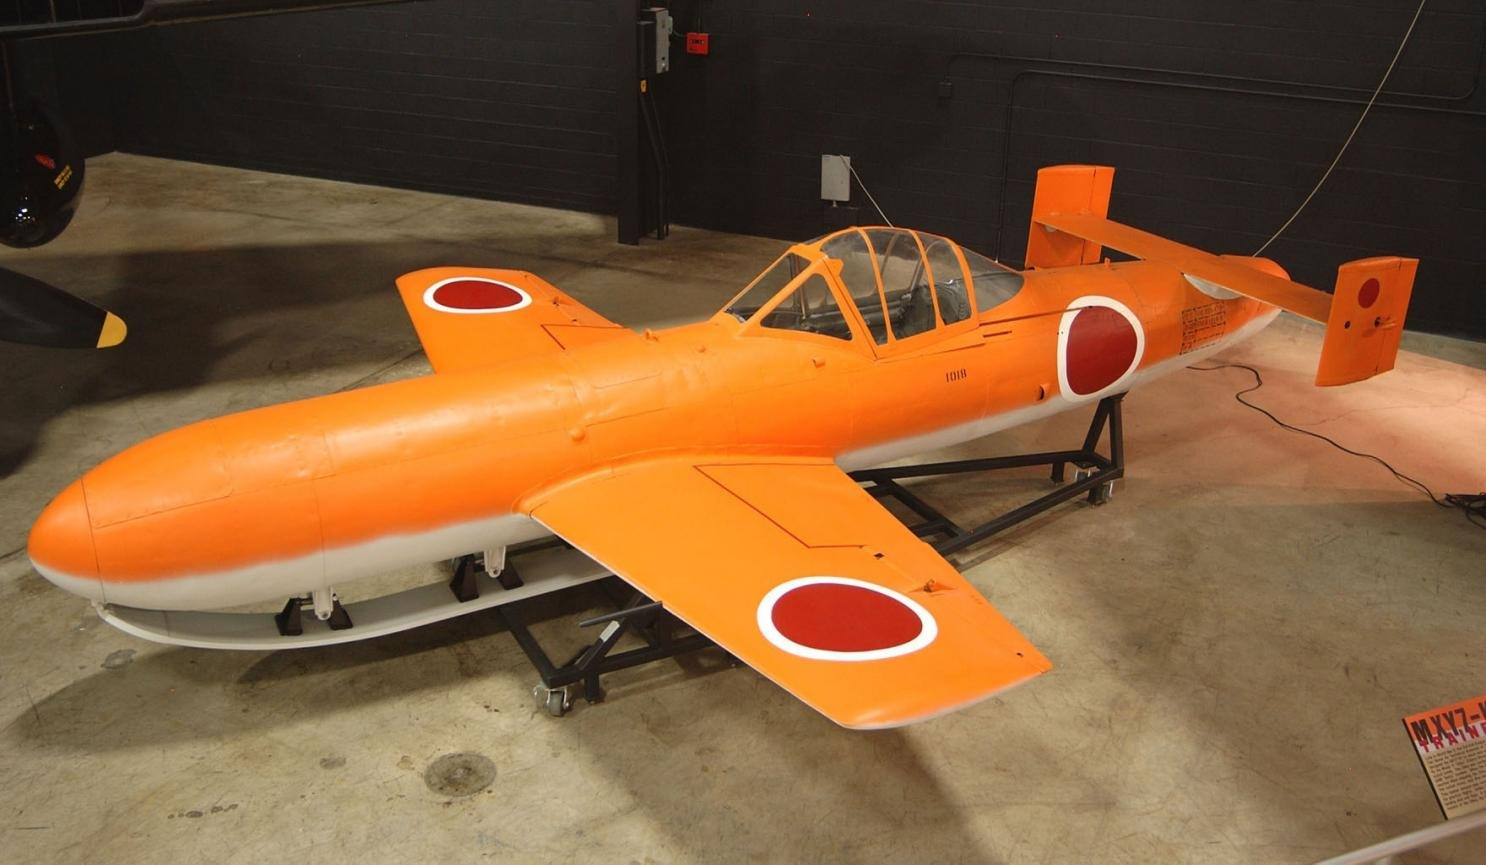 This is Japan's World War II Kamikaze Jet Fighter - Warrior Maven